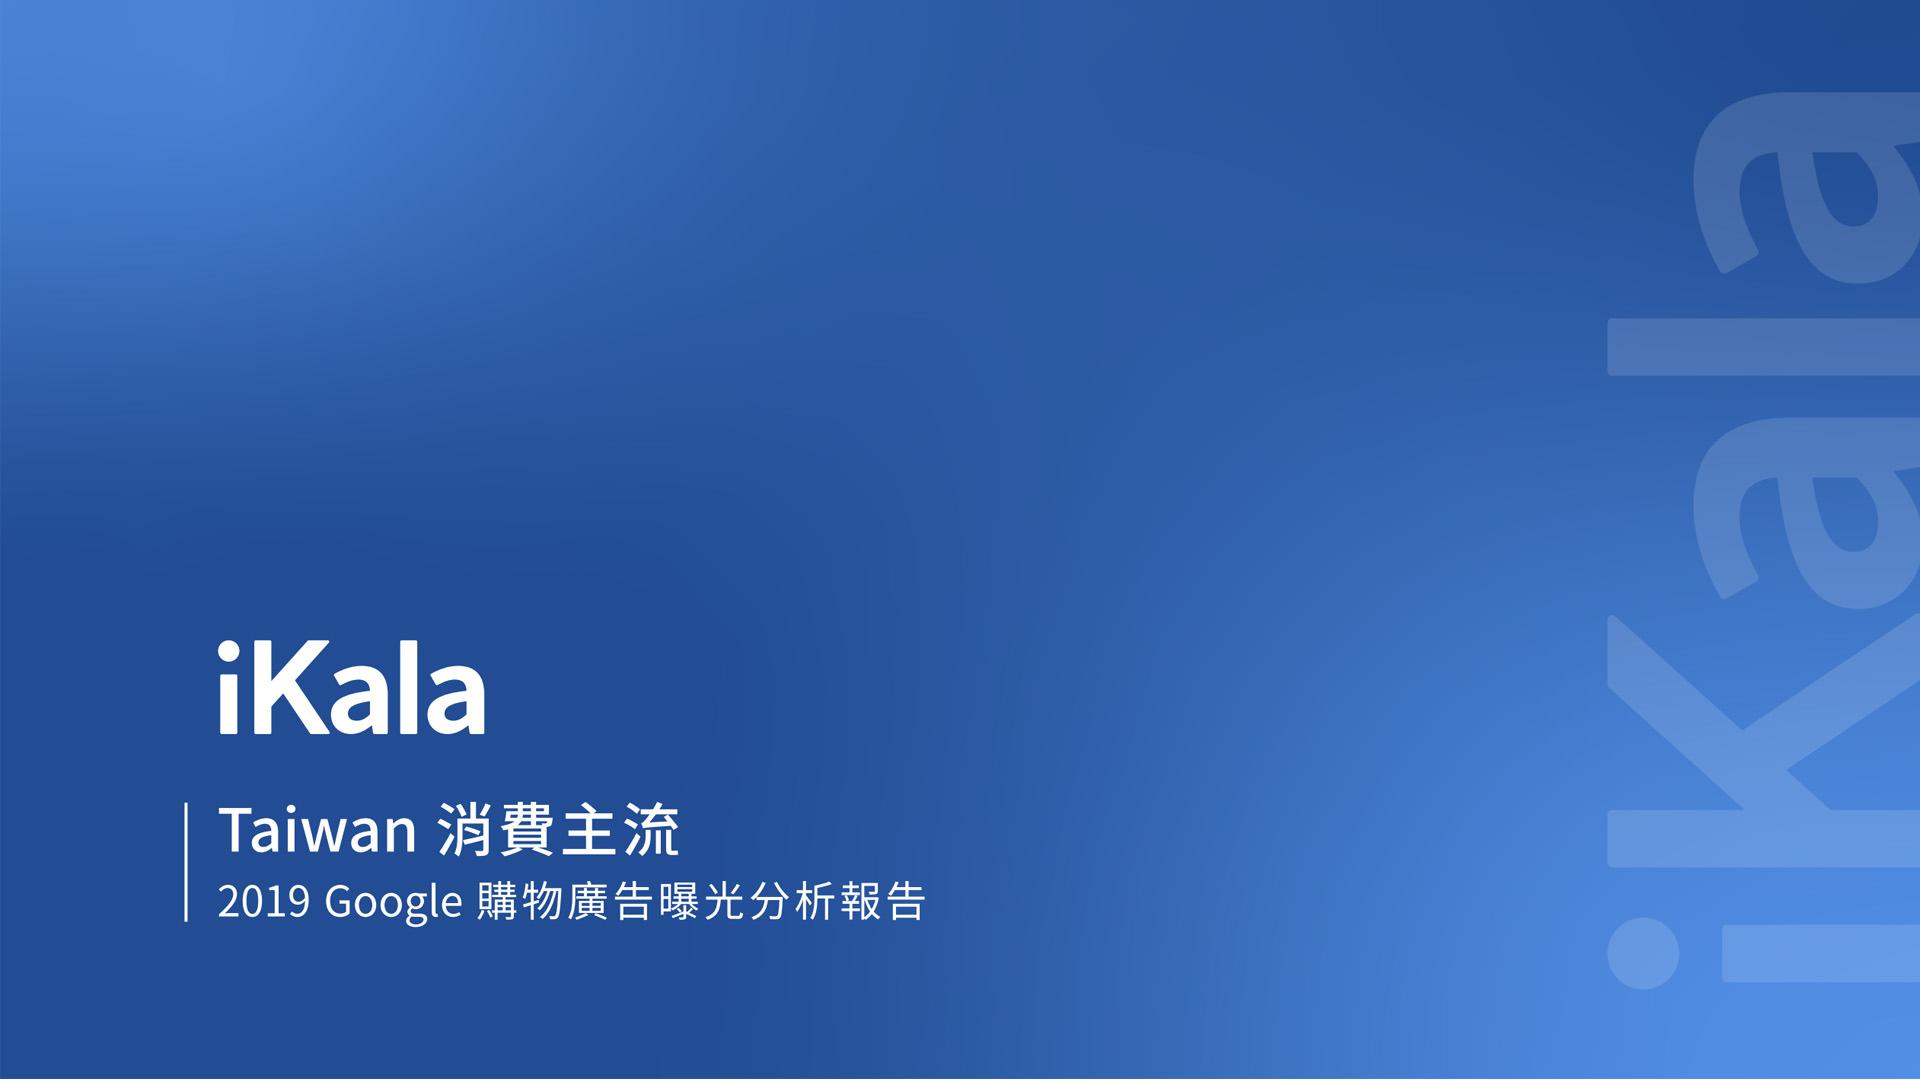 iKala 數位廣告分析報告